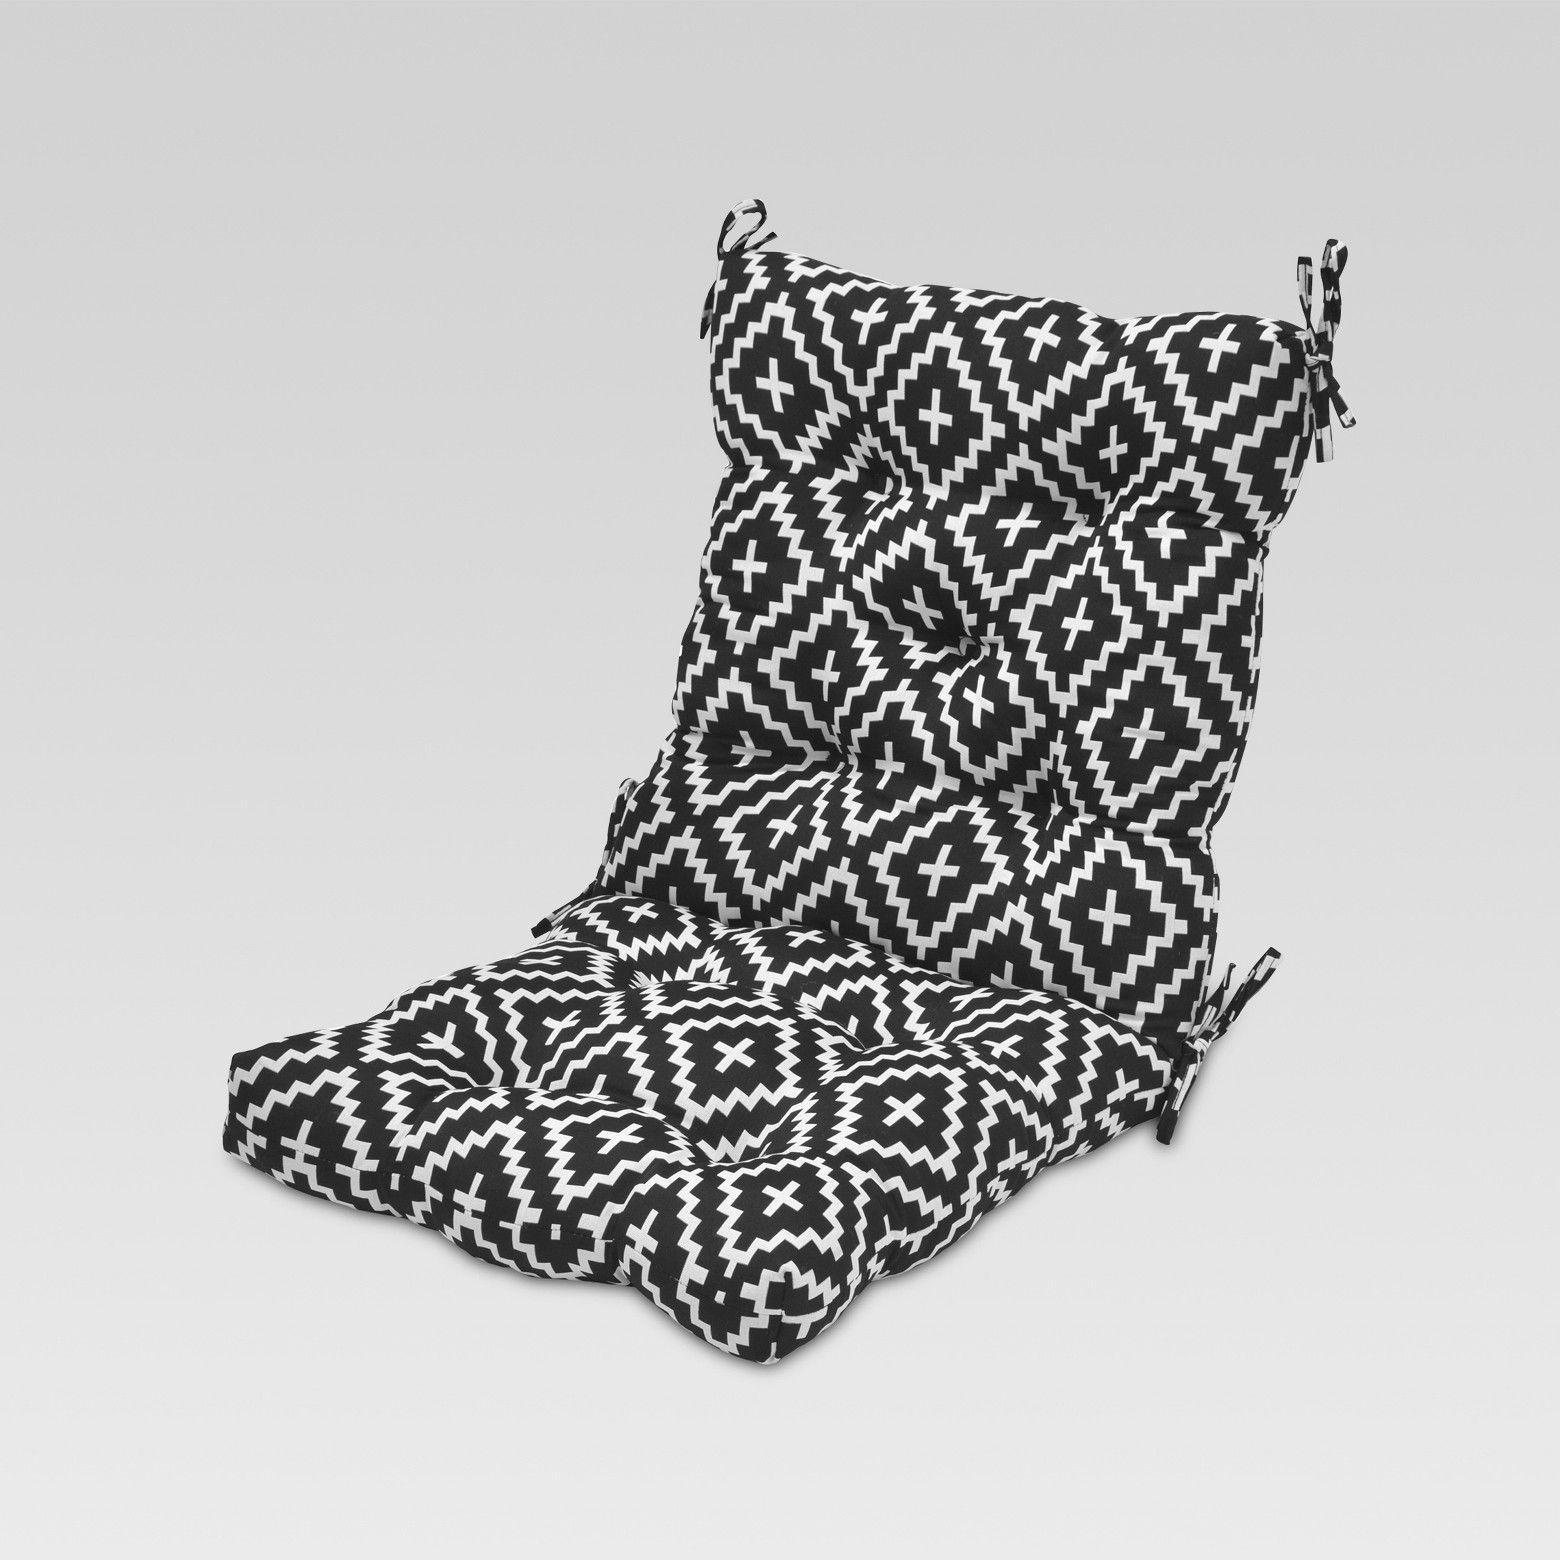 Threshold Tufted Chair Cushion Pattern